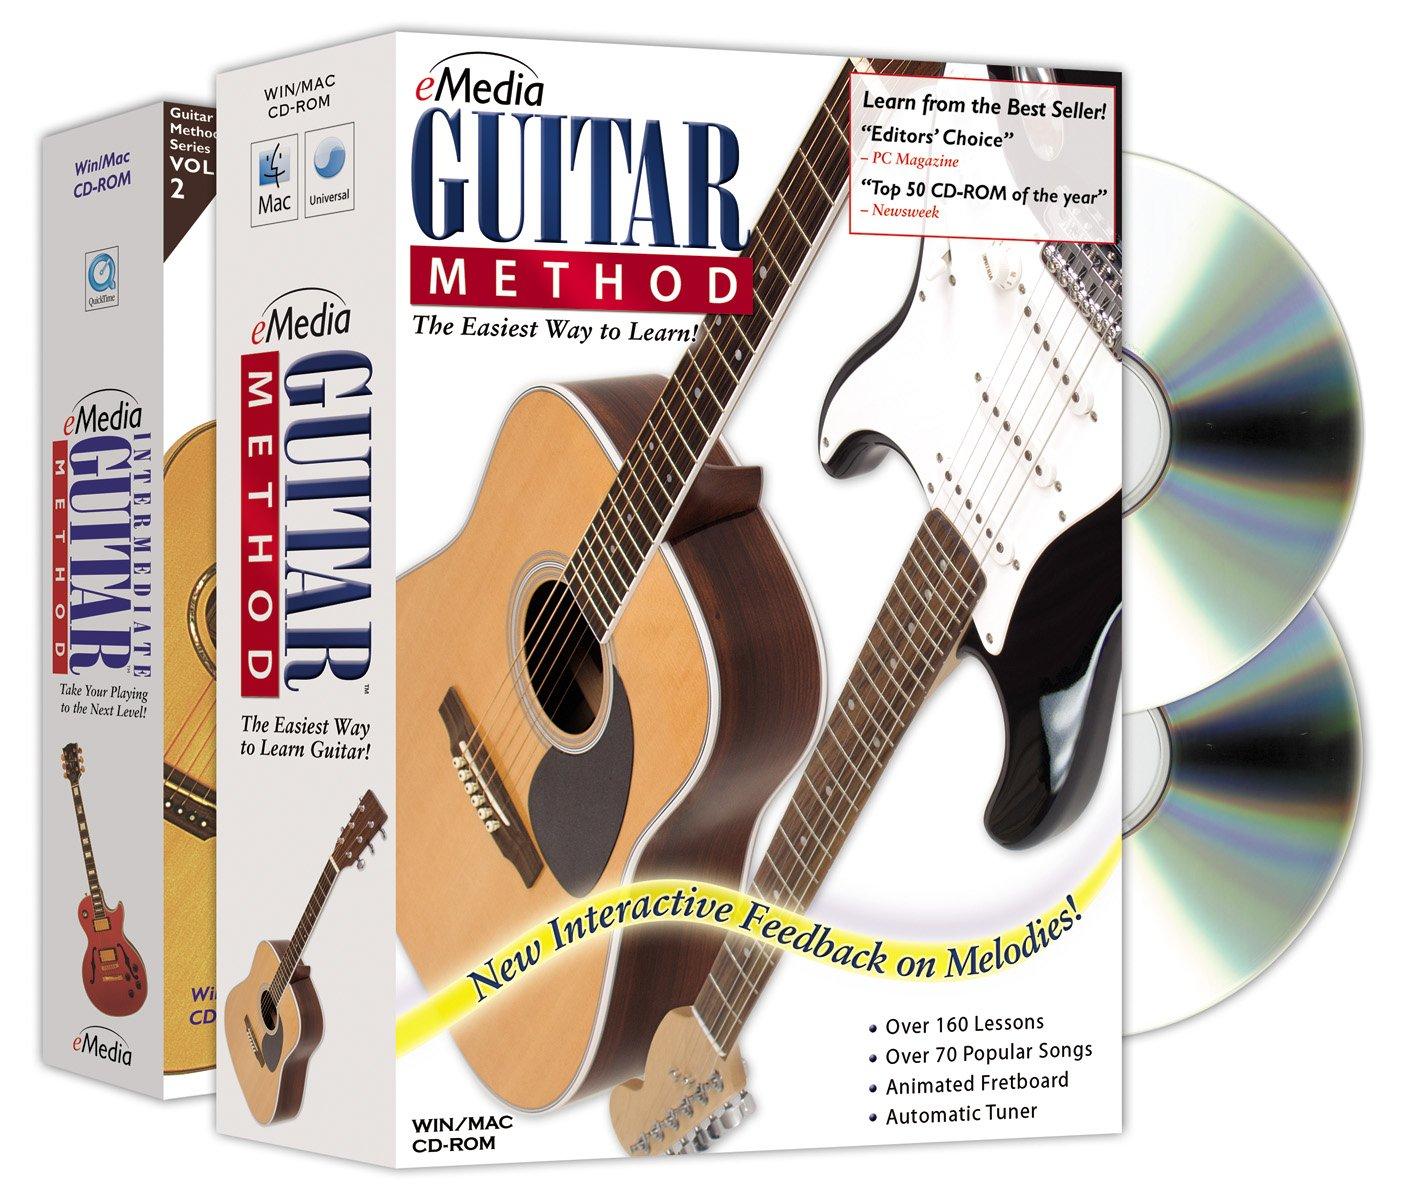 eMedia Guitar Method Deluxe [Old Version, v5] EG10101 AmzRecEq02019